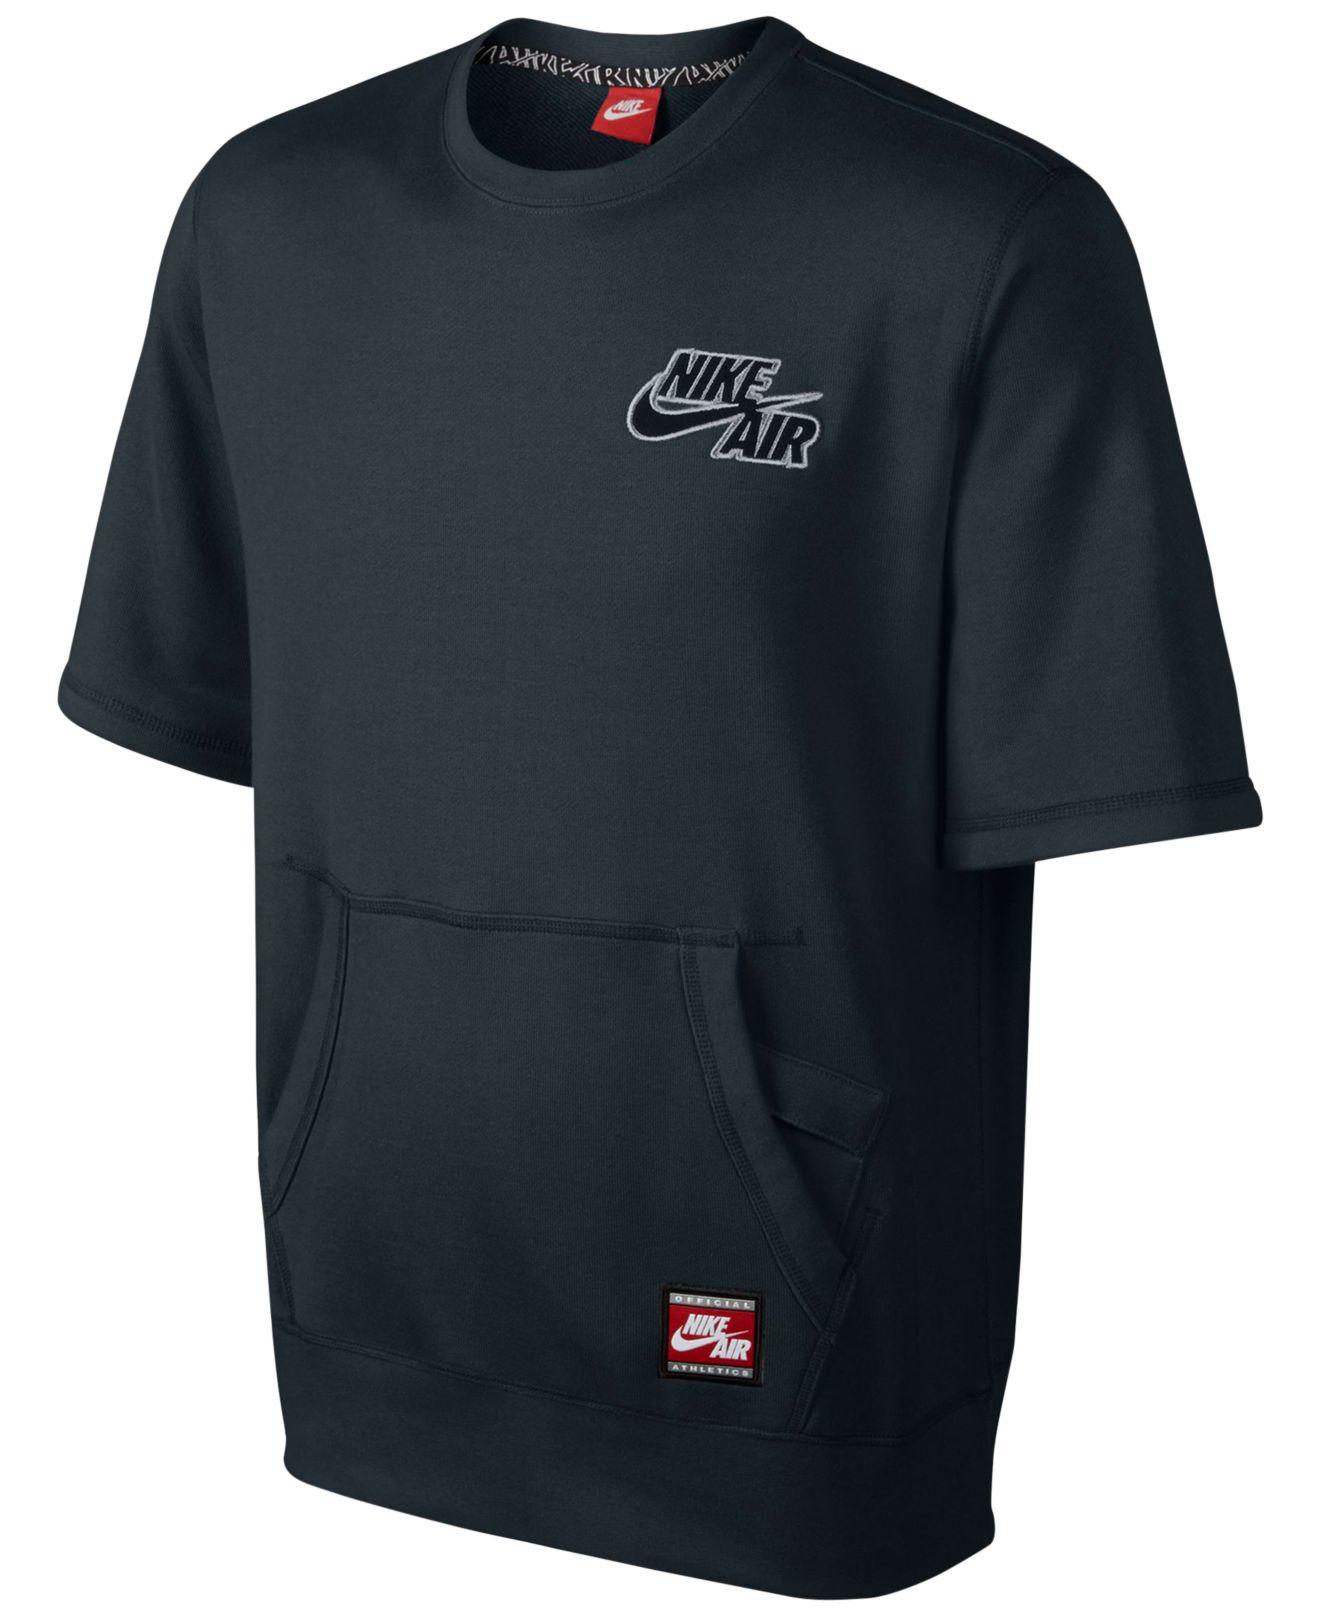 Air Men Lyst Short Black For Pullover Sleeve Nike Sweatshirt In Men s  ffqTxUwR feb76a70b